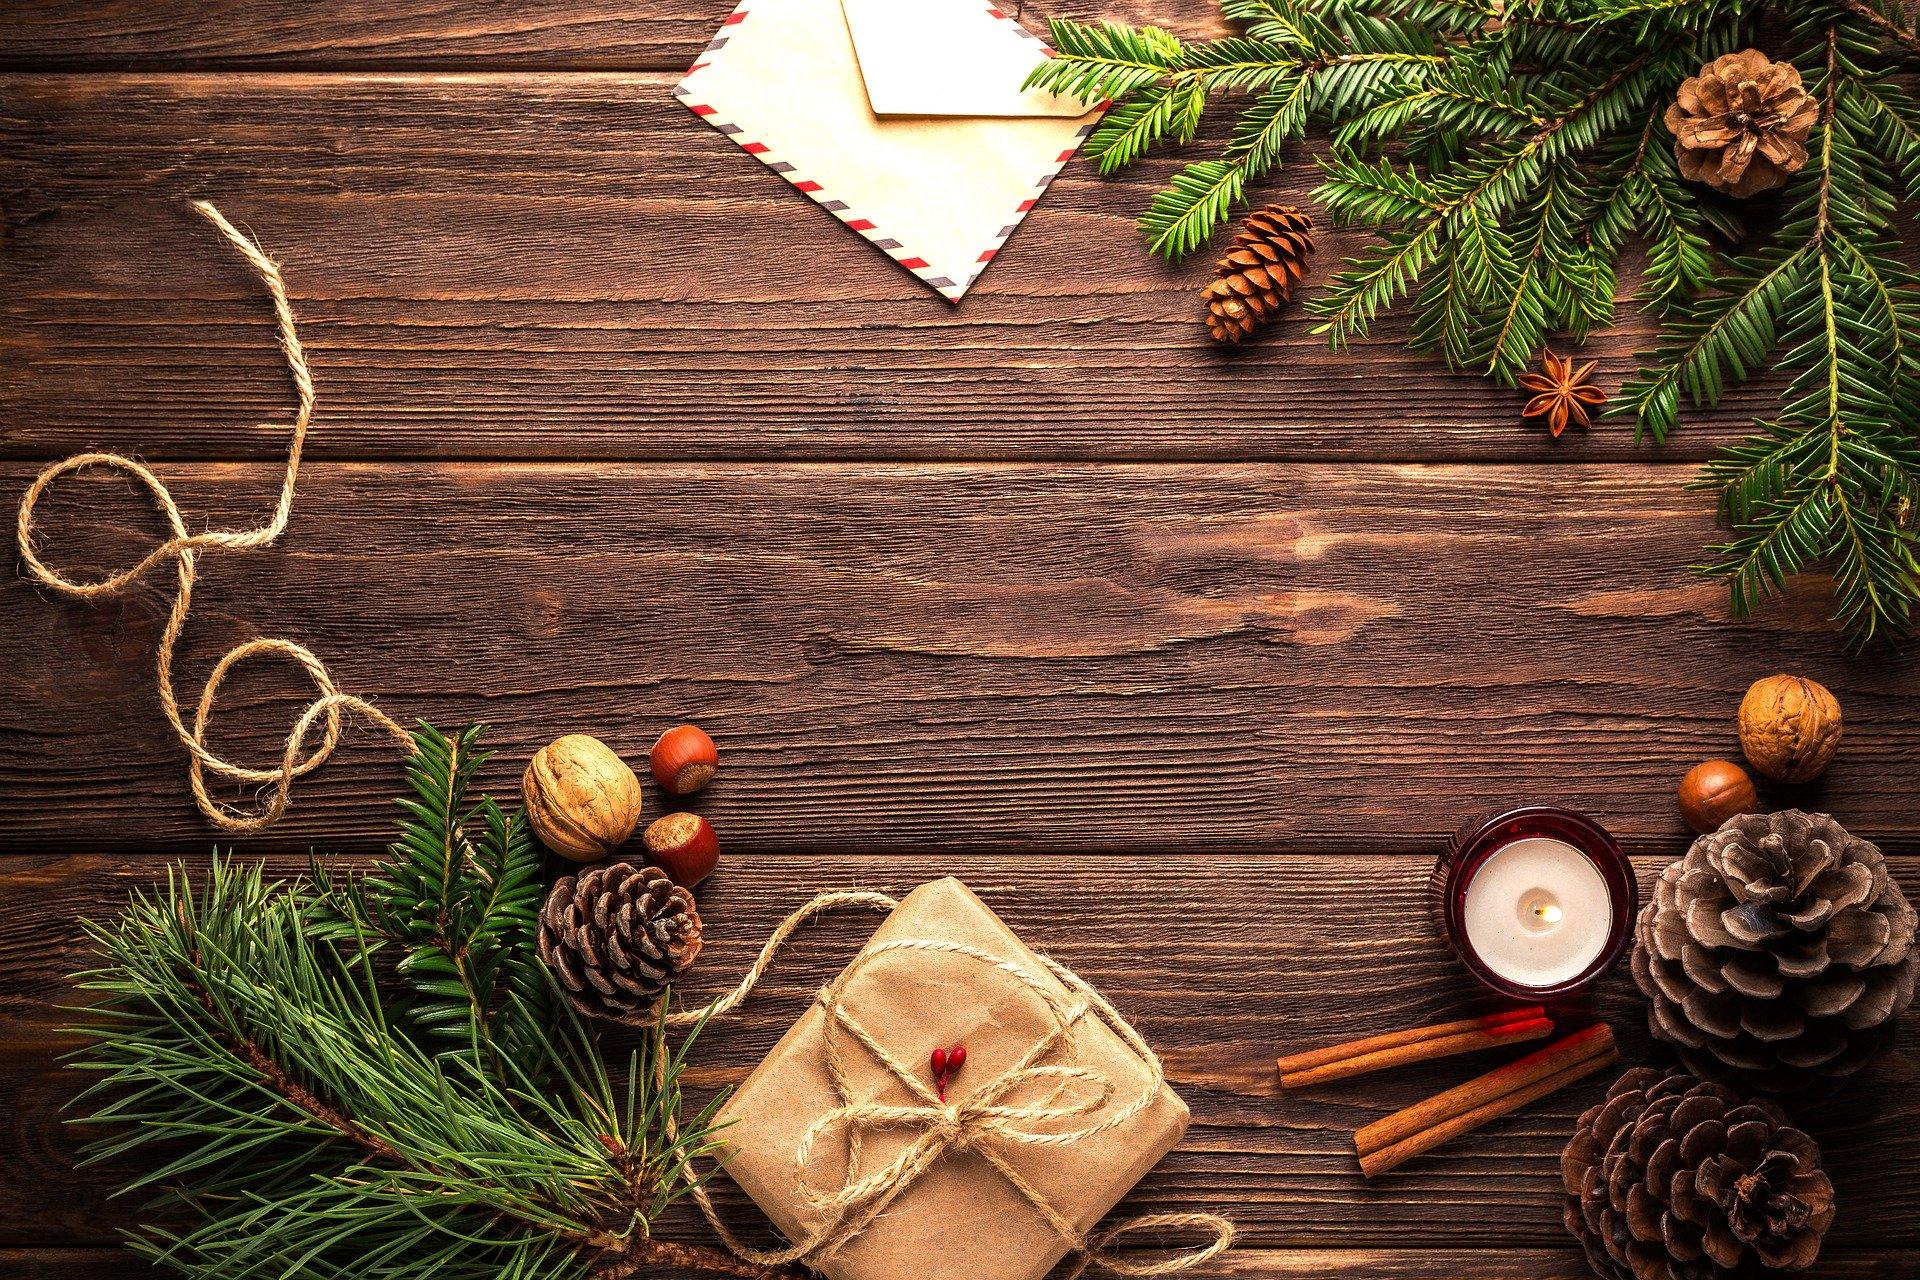 Zockerclub wünscht frohe Weihnachten!